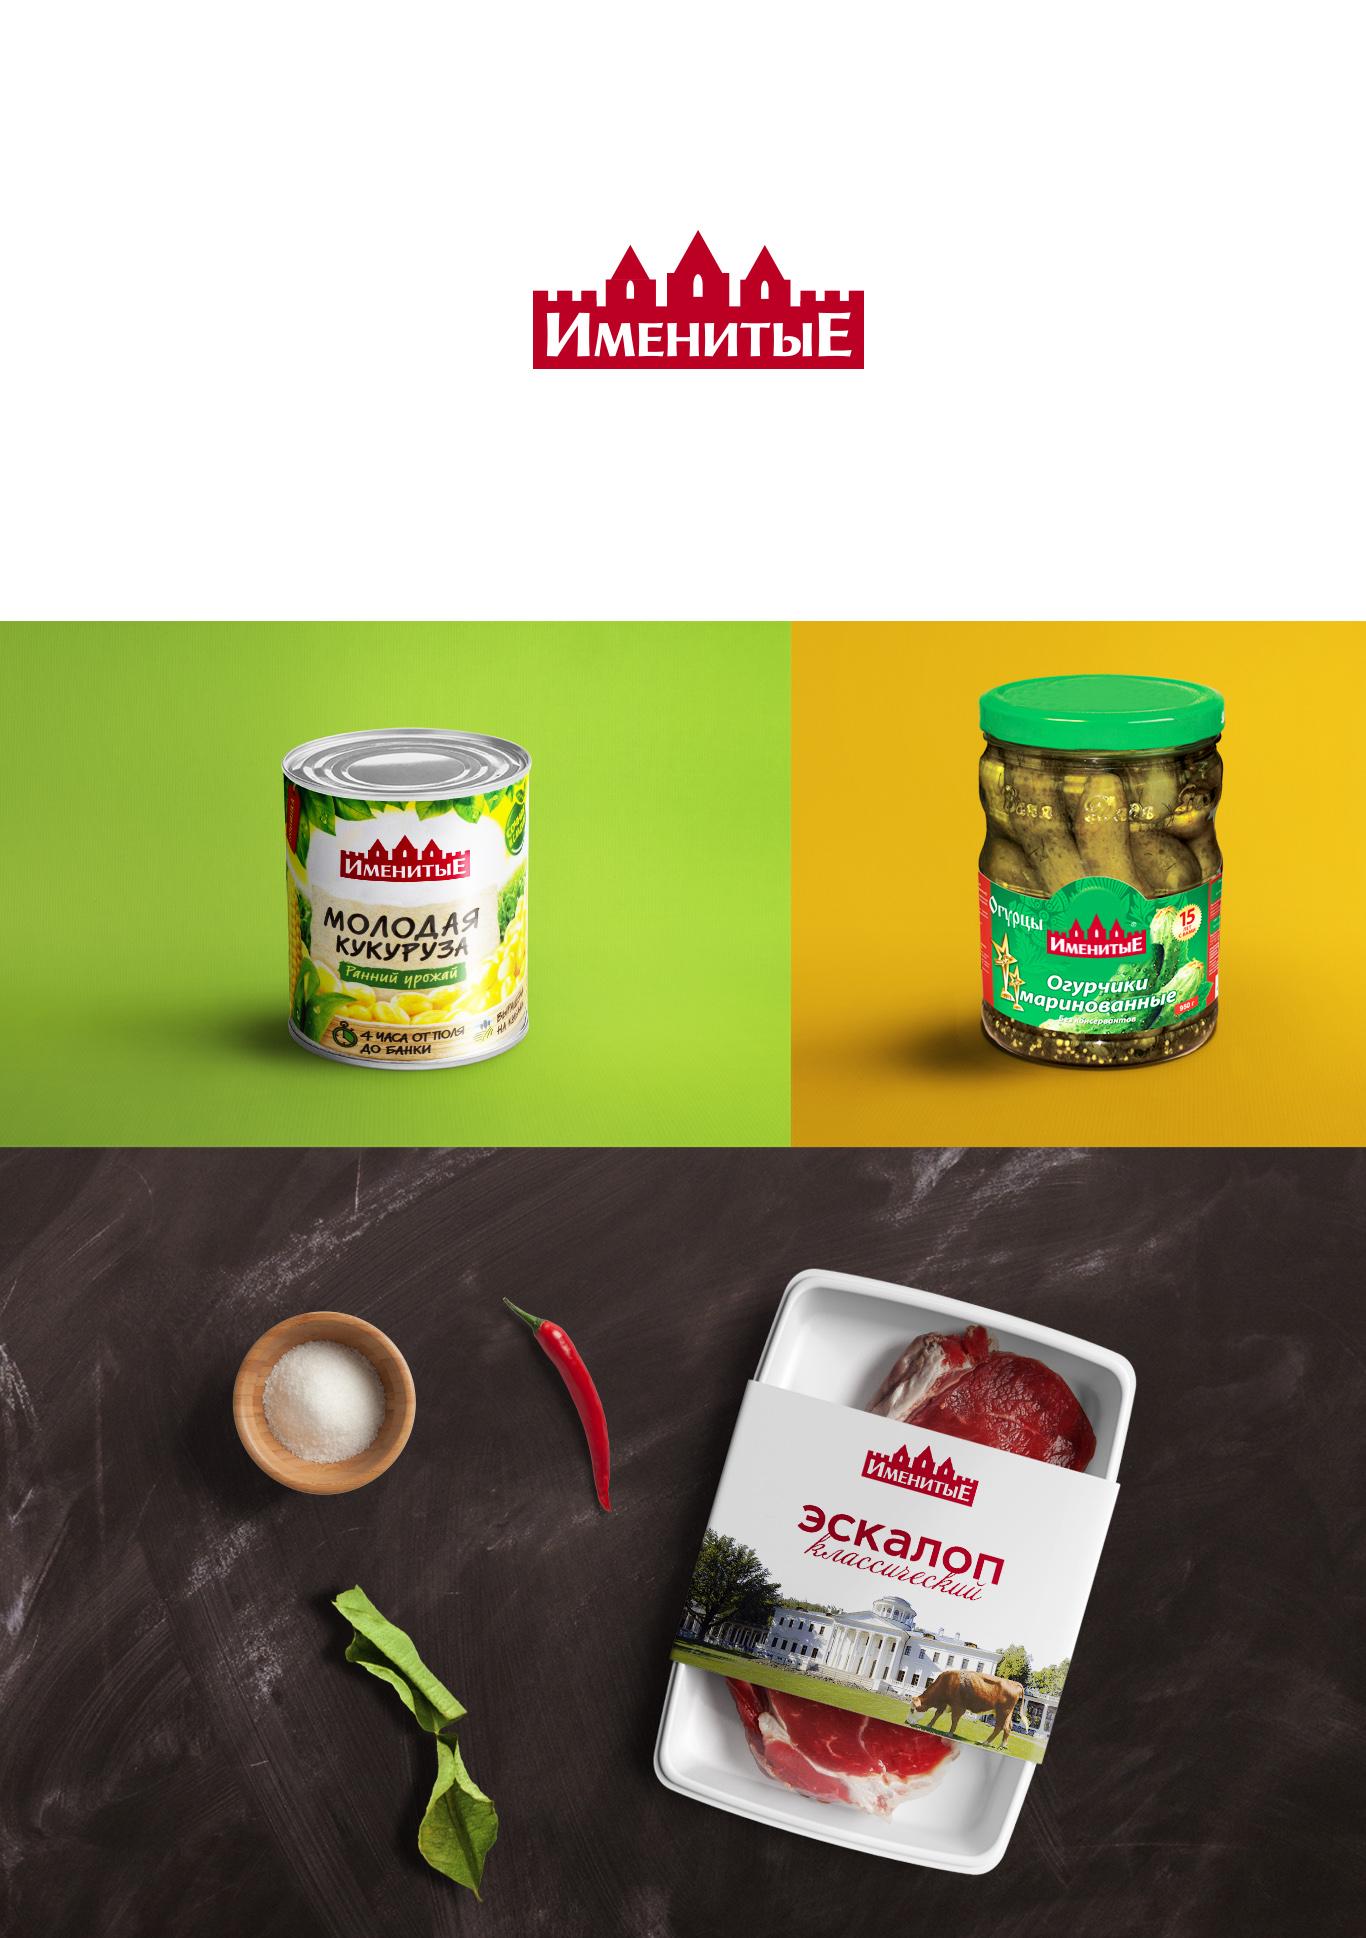 Логотип и фирменный стиль продуктов питания фото f_1225bc4e64863efb.jpg